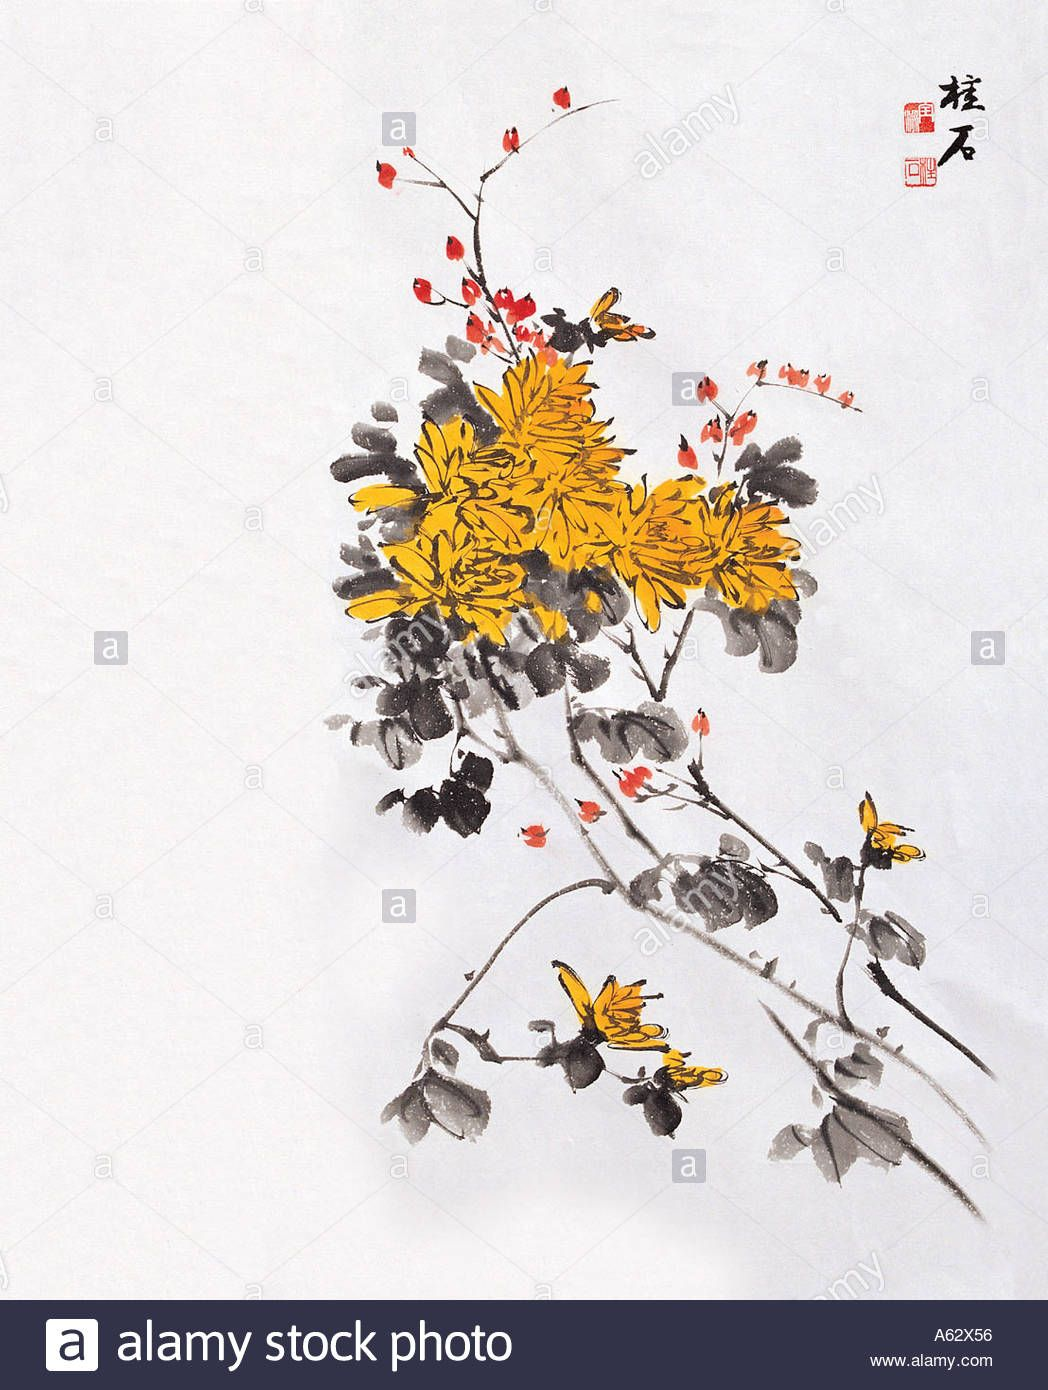 Download This Stock Image Korean Painting